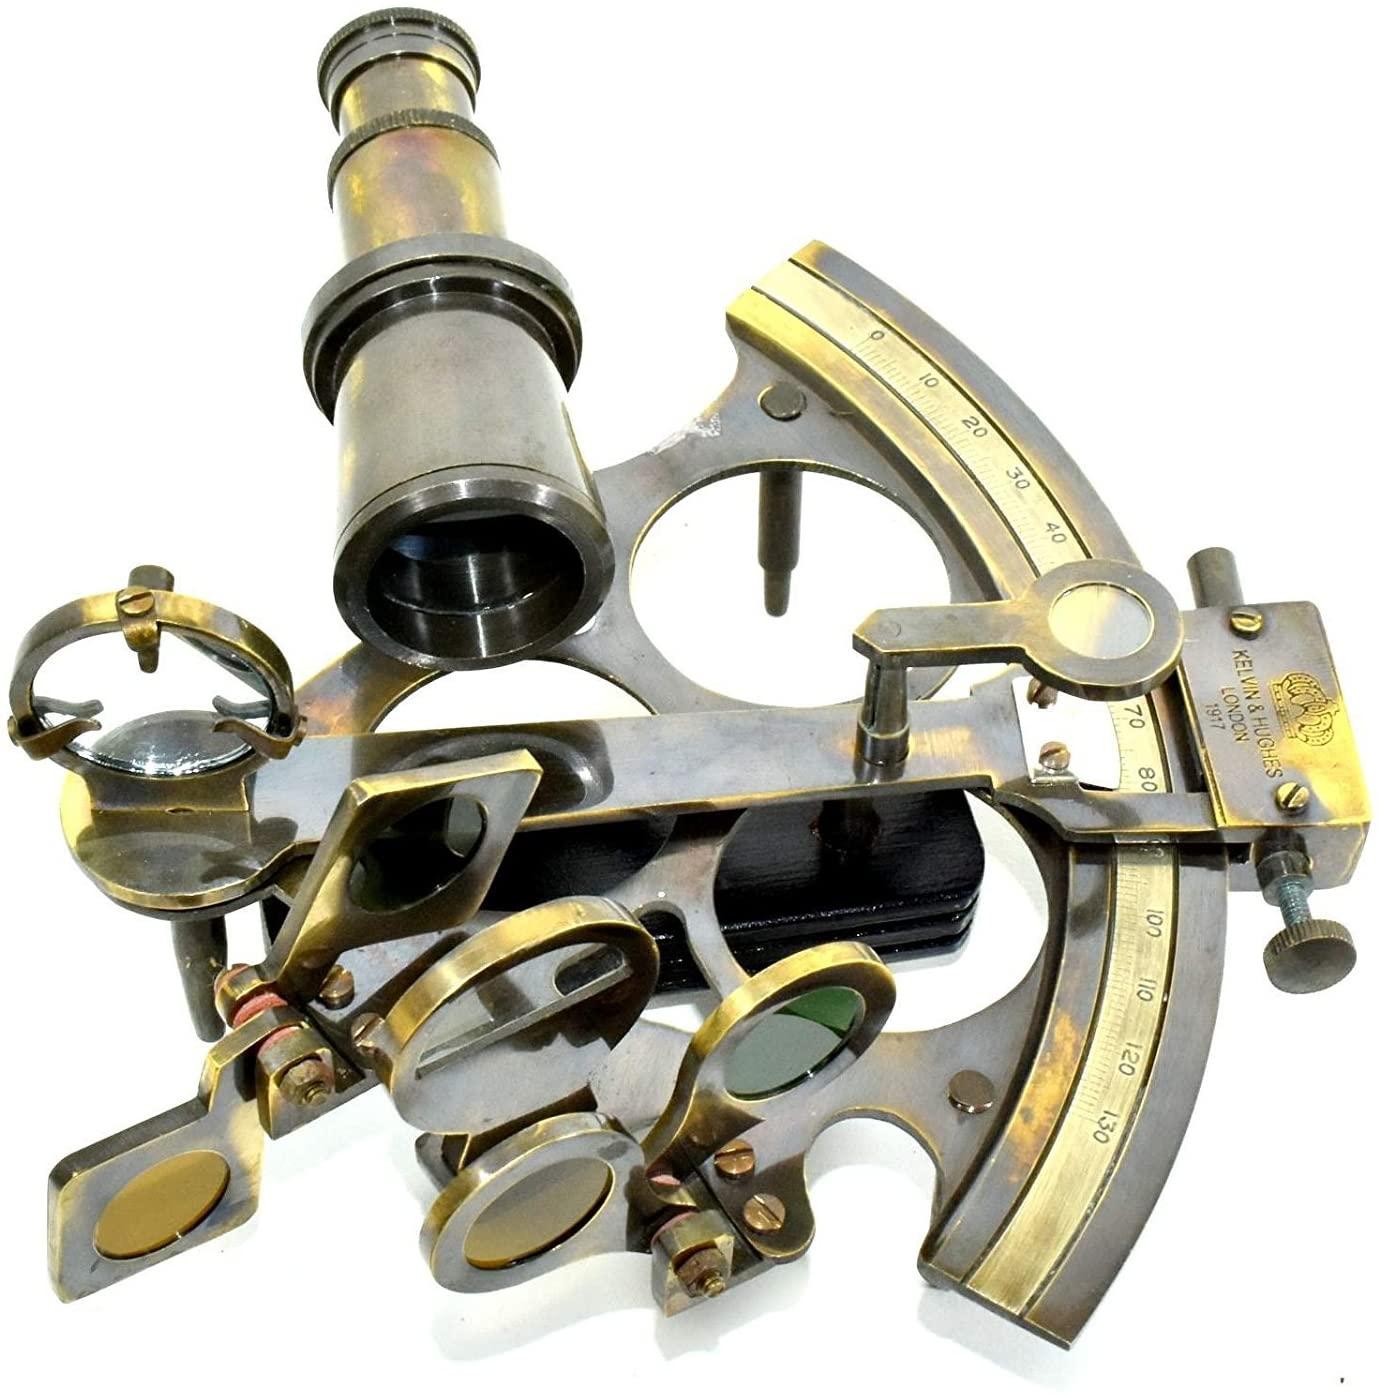 Brass Sextant Astrolabe Maritime Nautical Navy Marine Sextant Decor Vintage Ship01